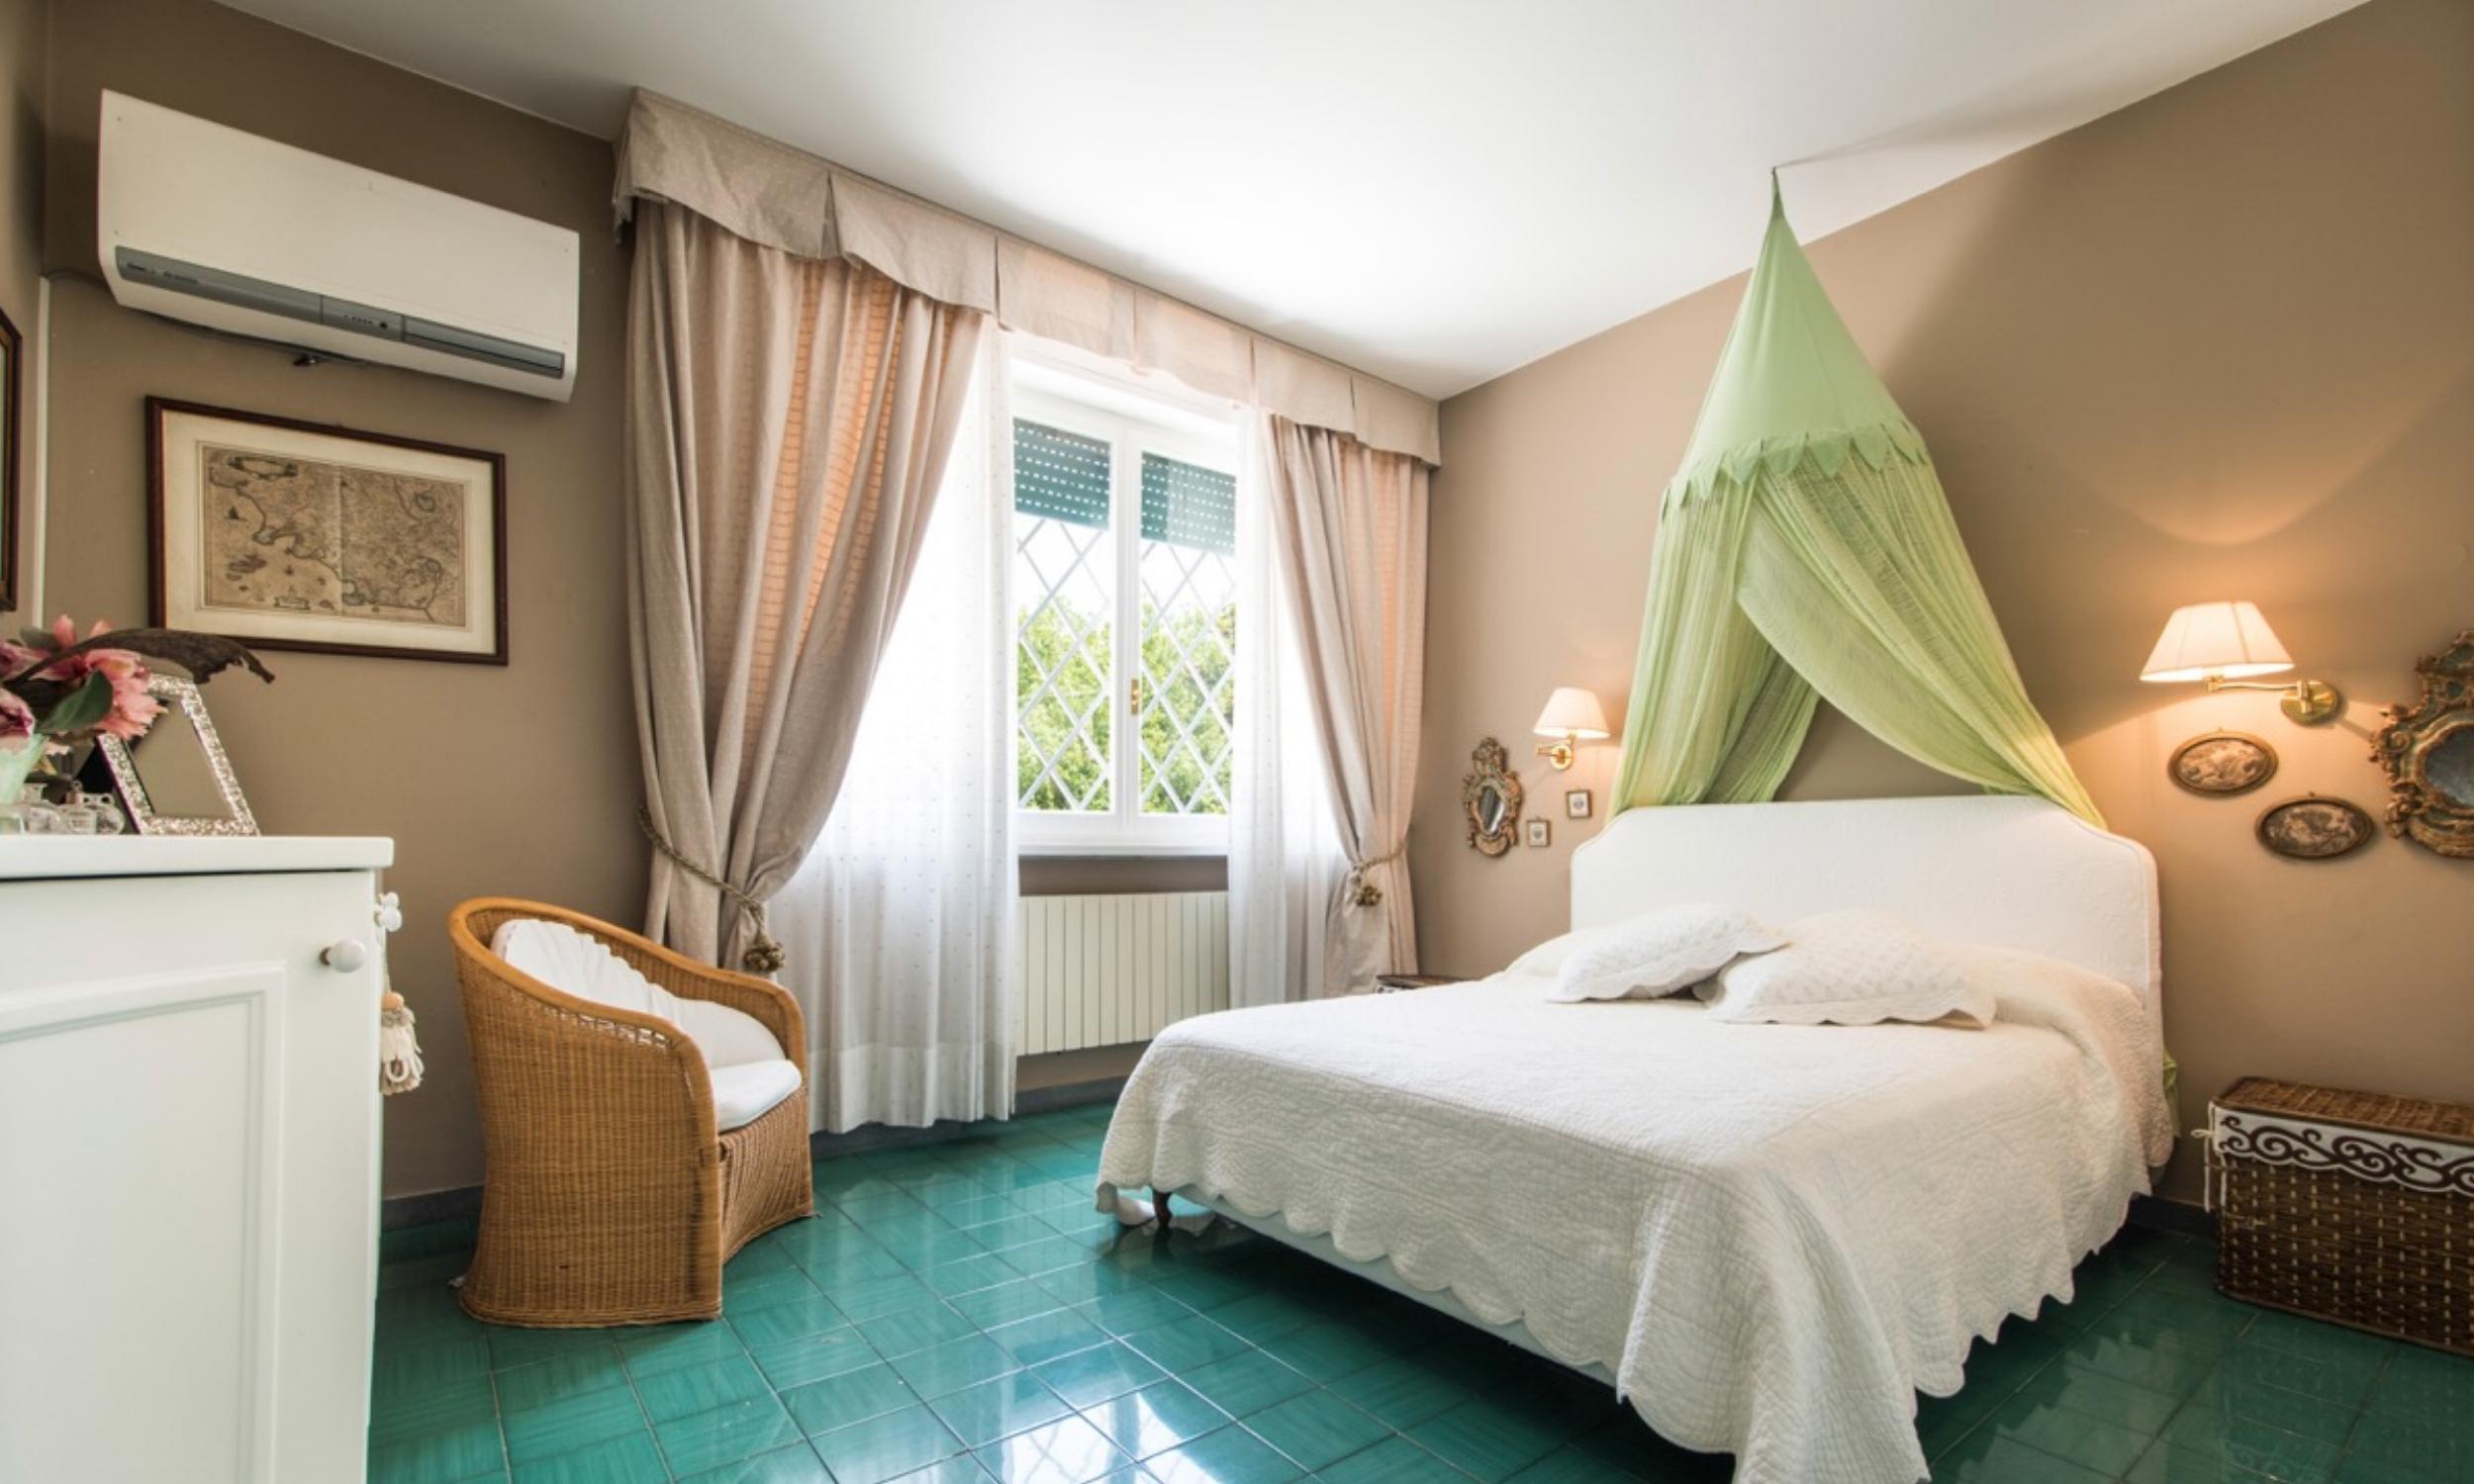 Bedroom06-01.jpg